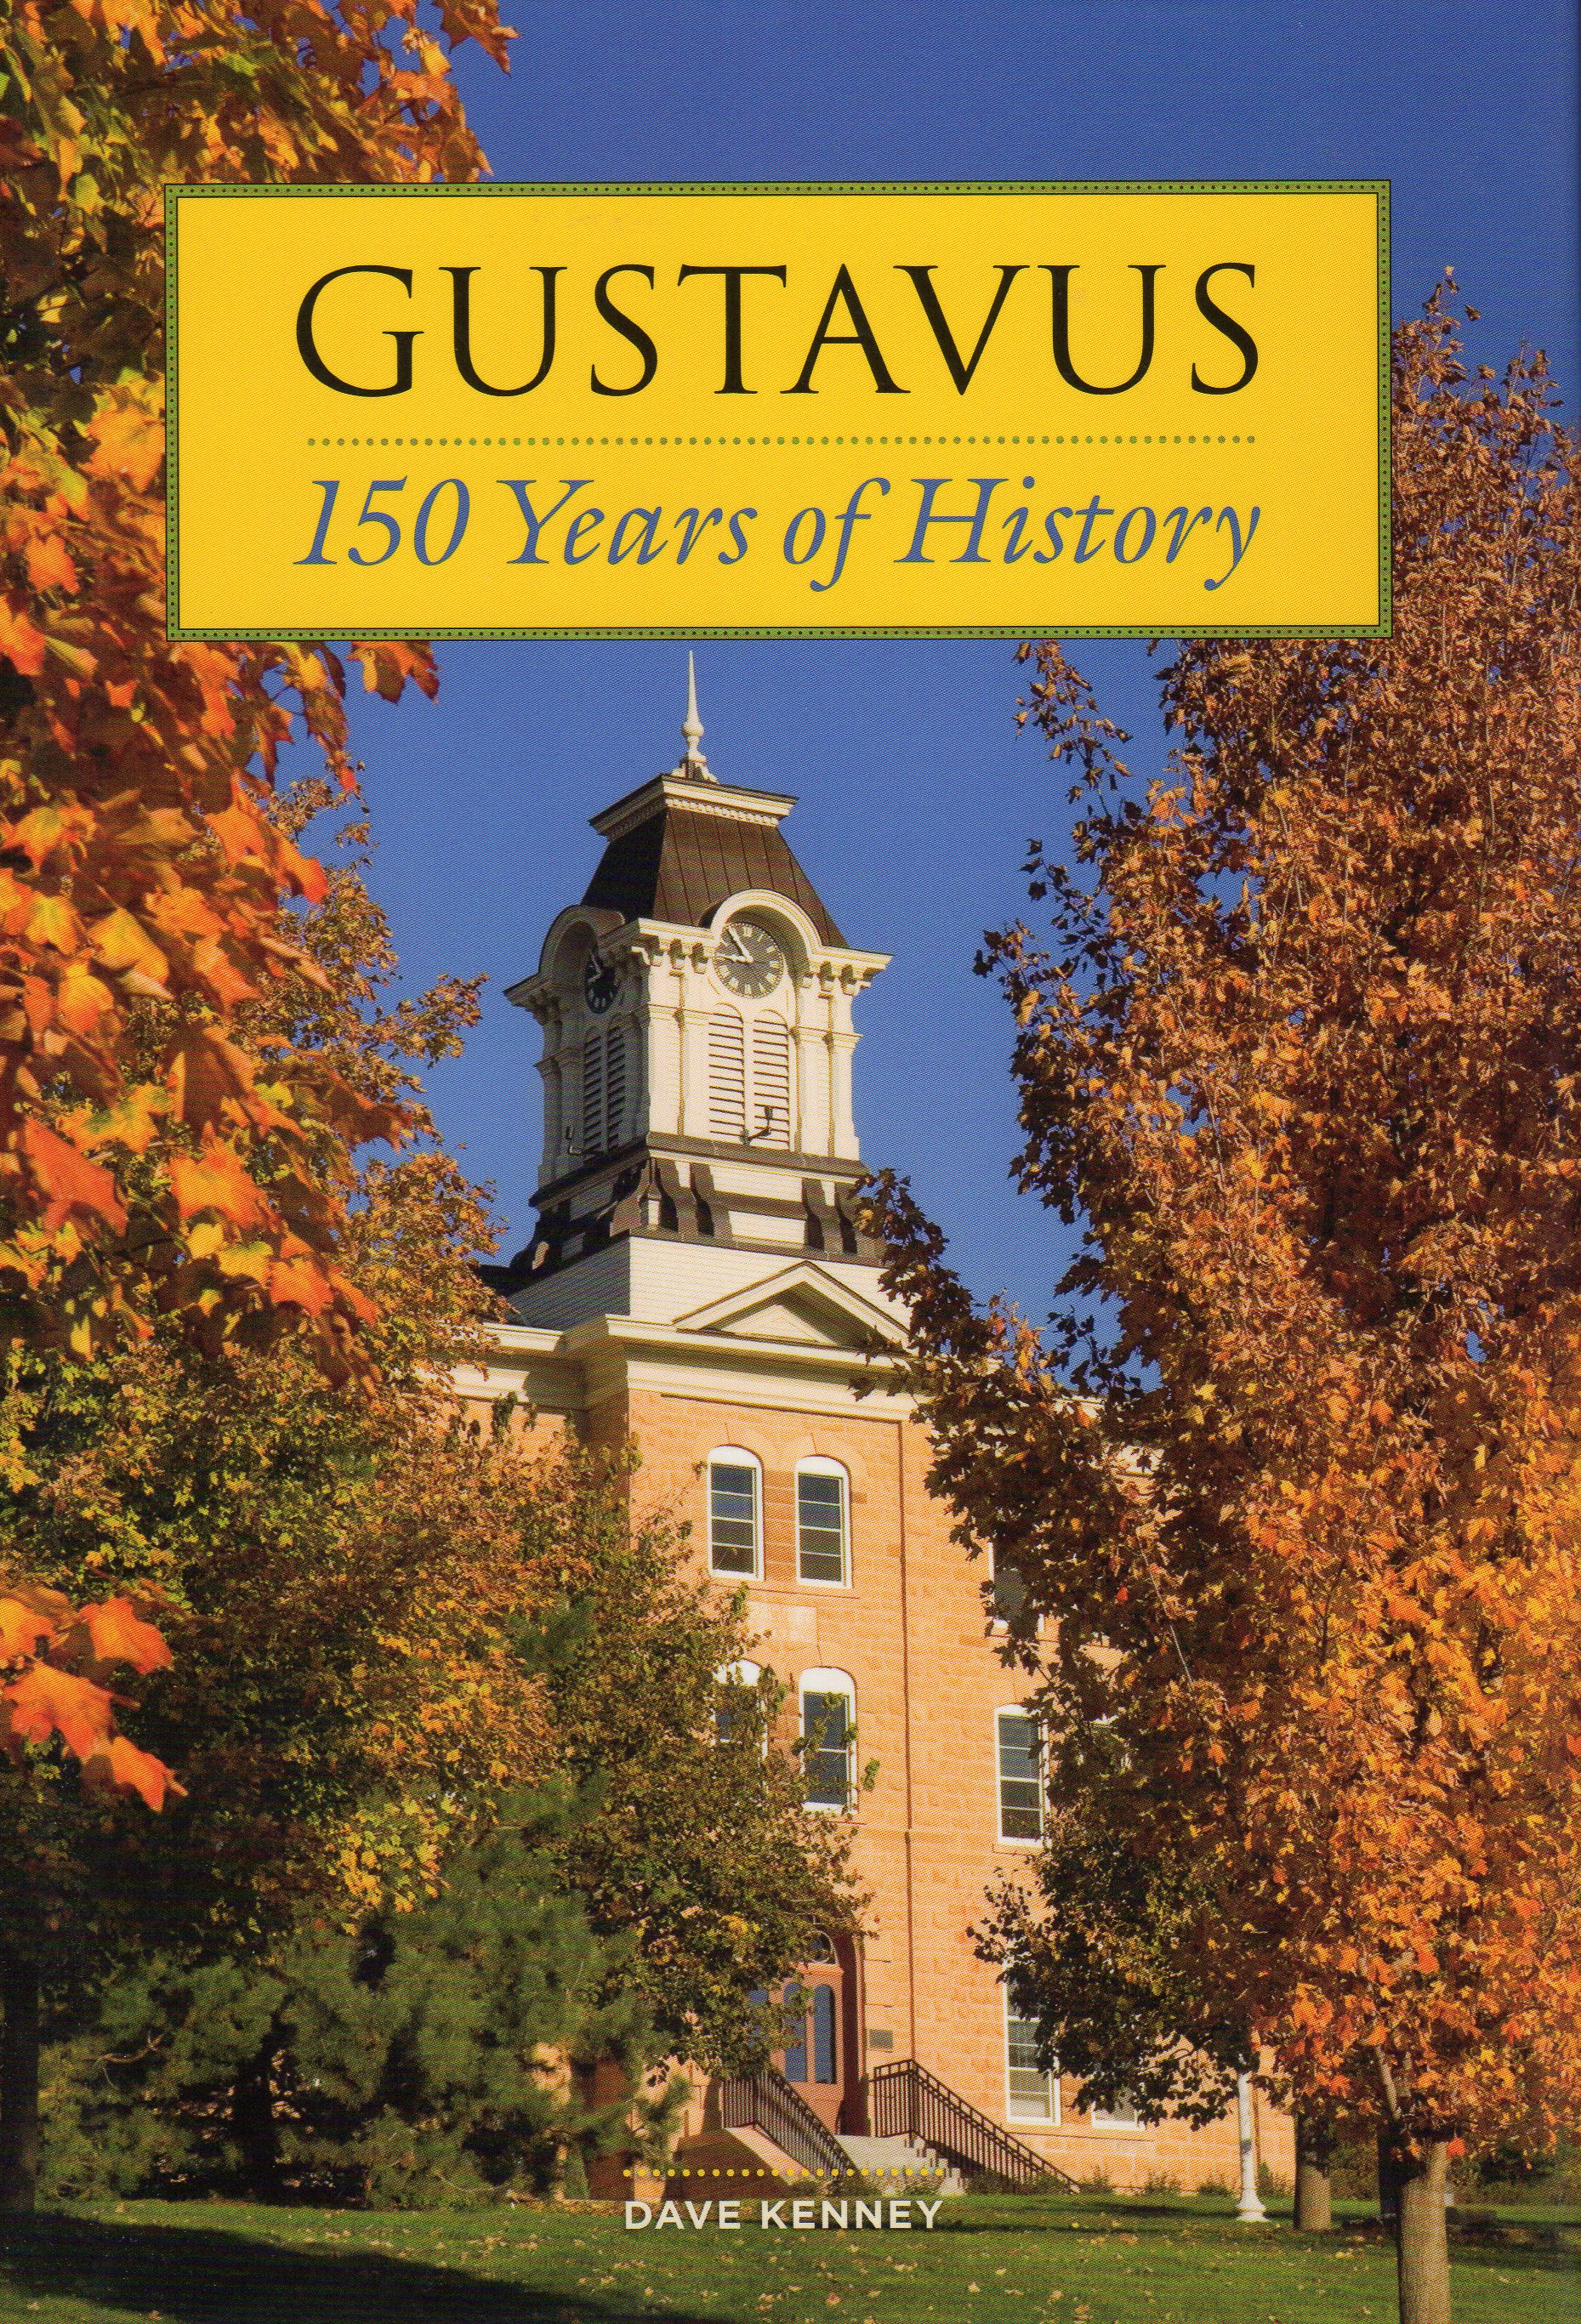 Gustavus: 150 Years of History